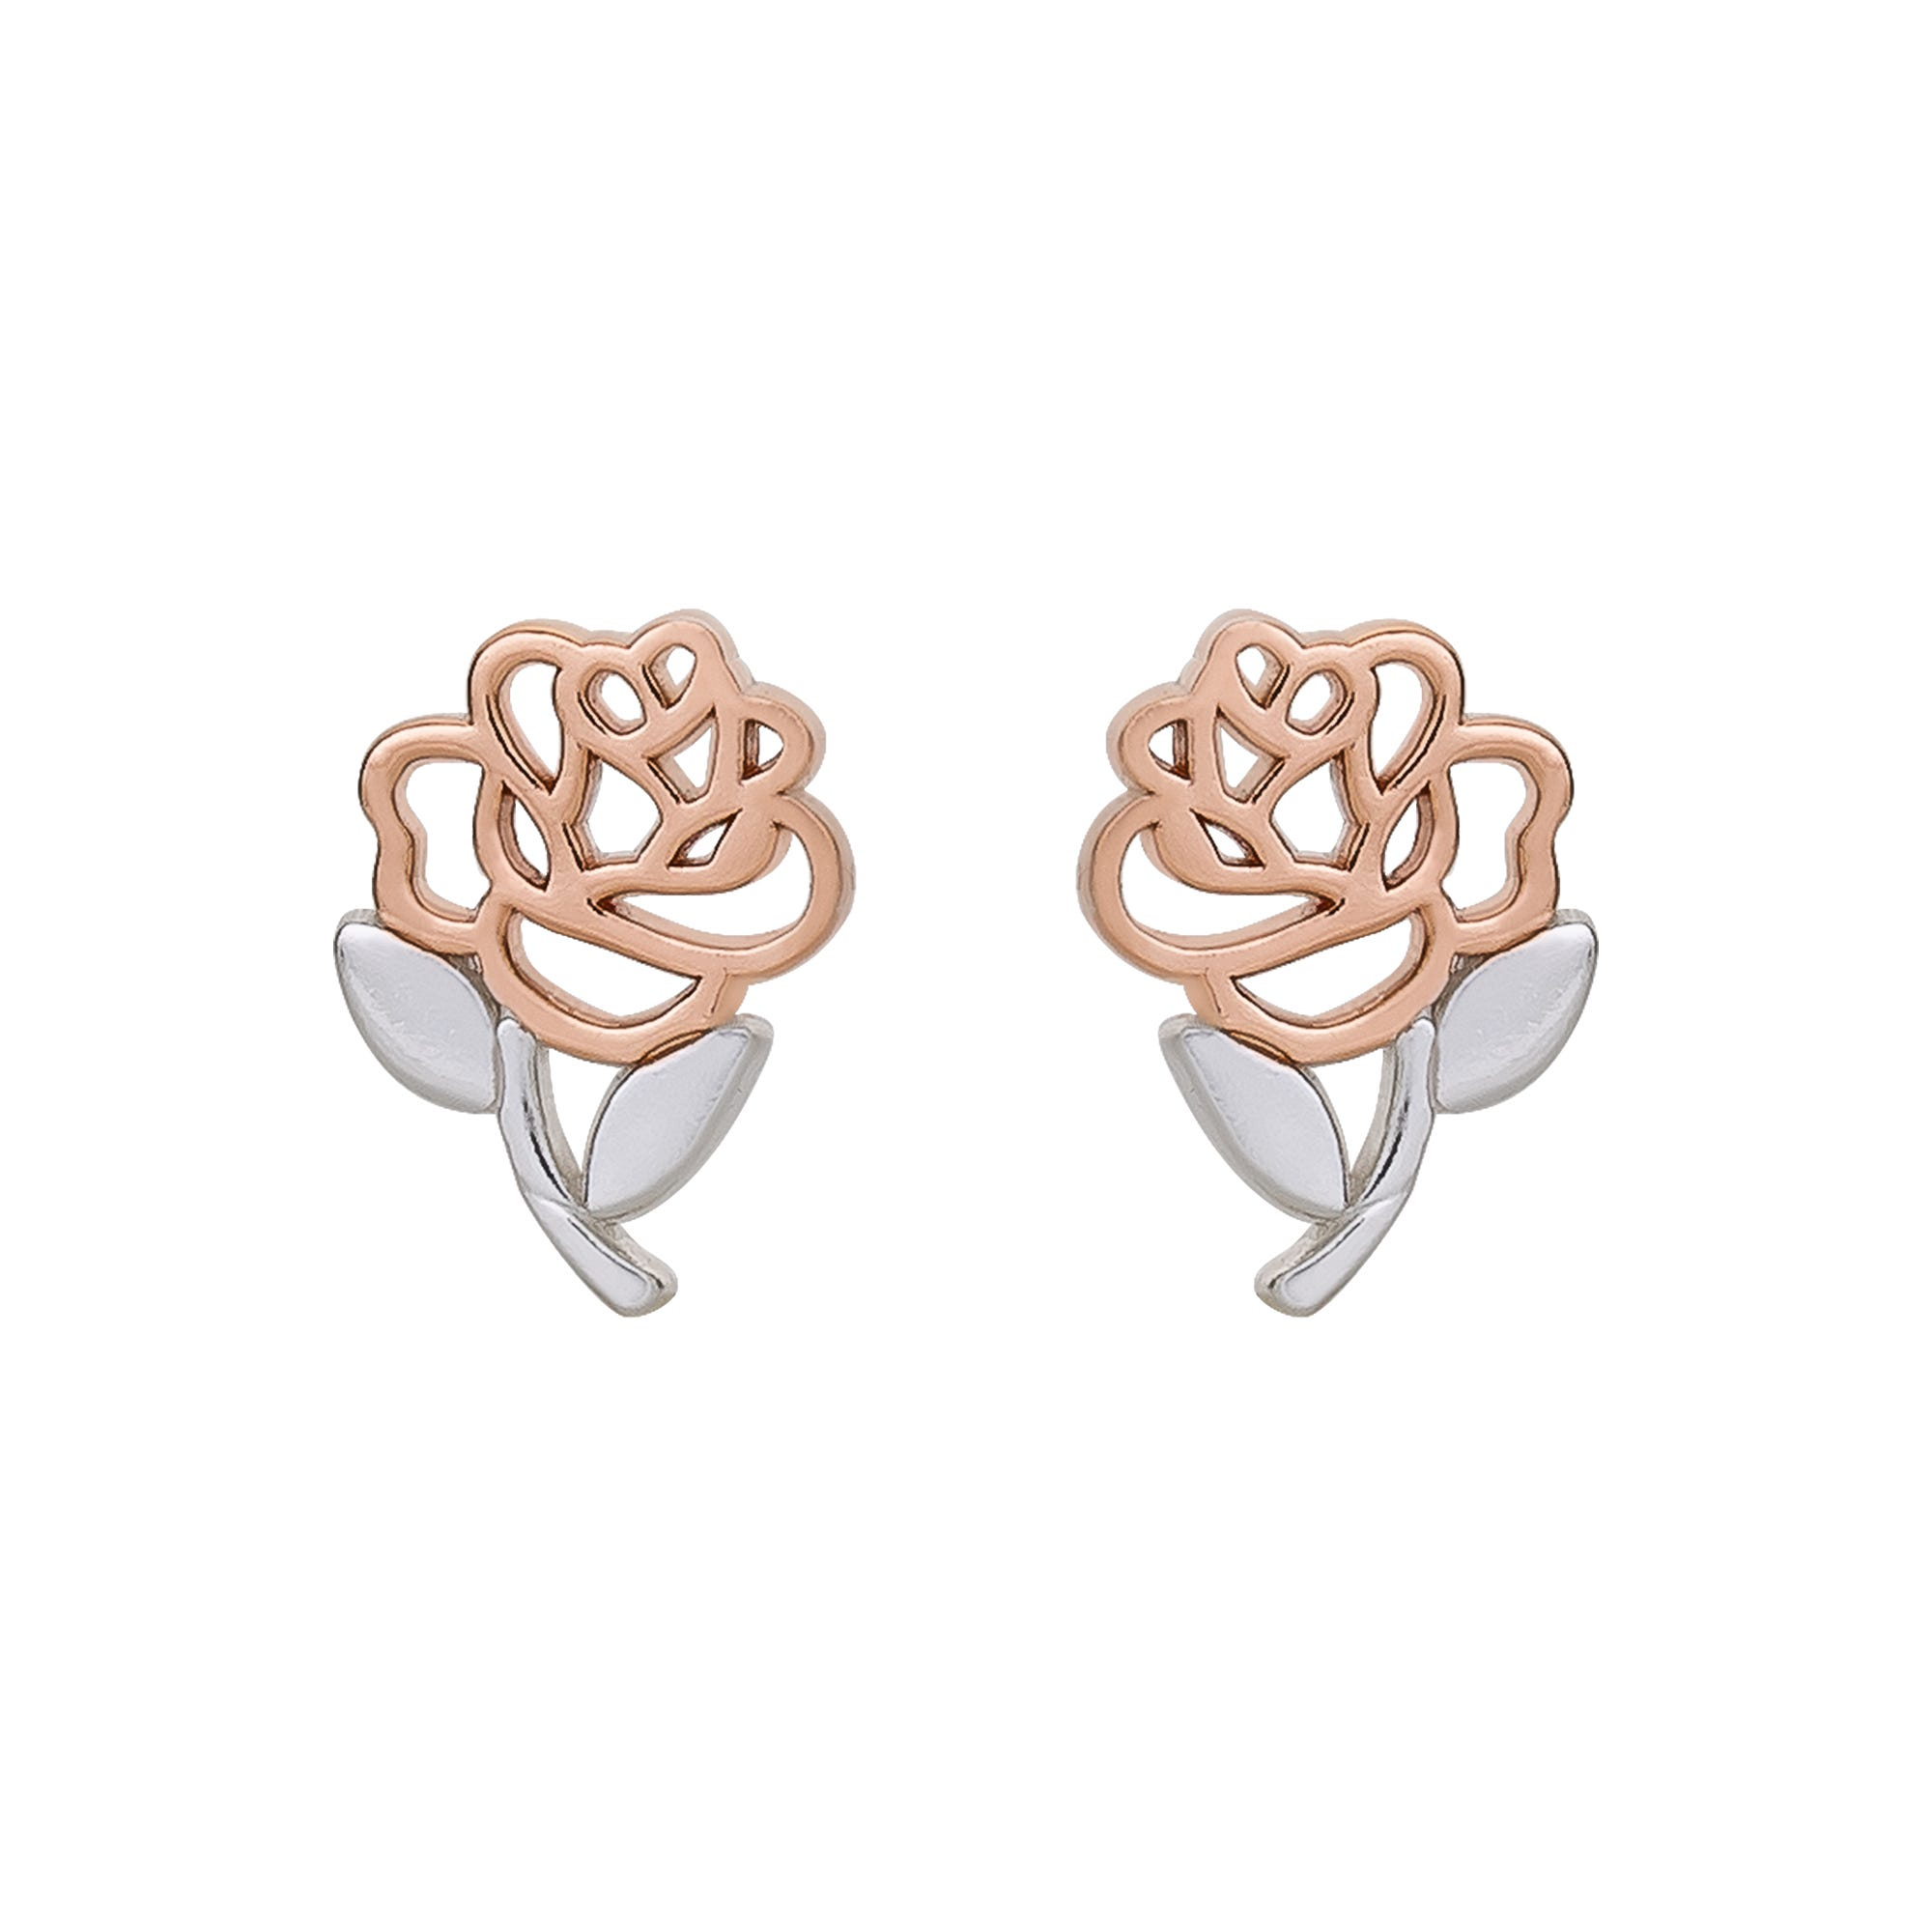 DISNEY© Beauty and The Beast Rose Stud Earrings in Sterling Silver